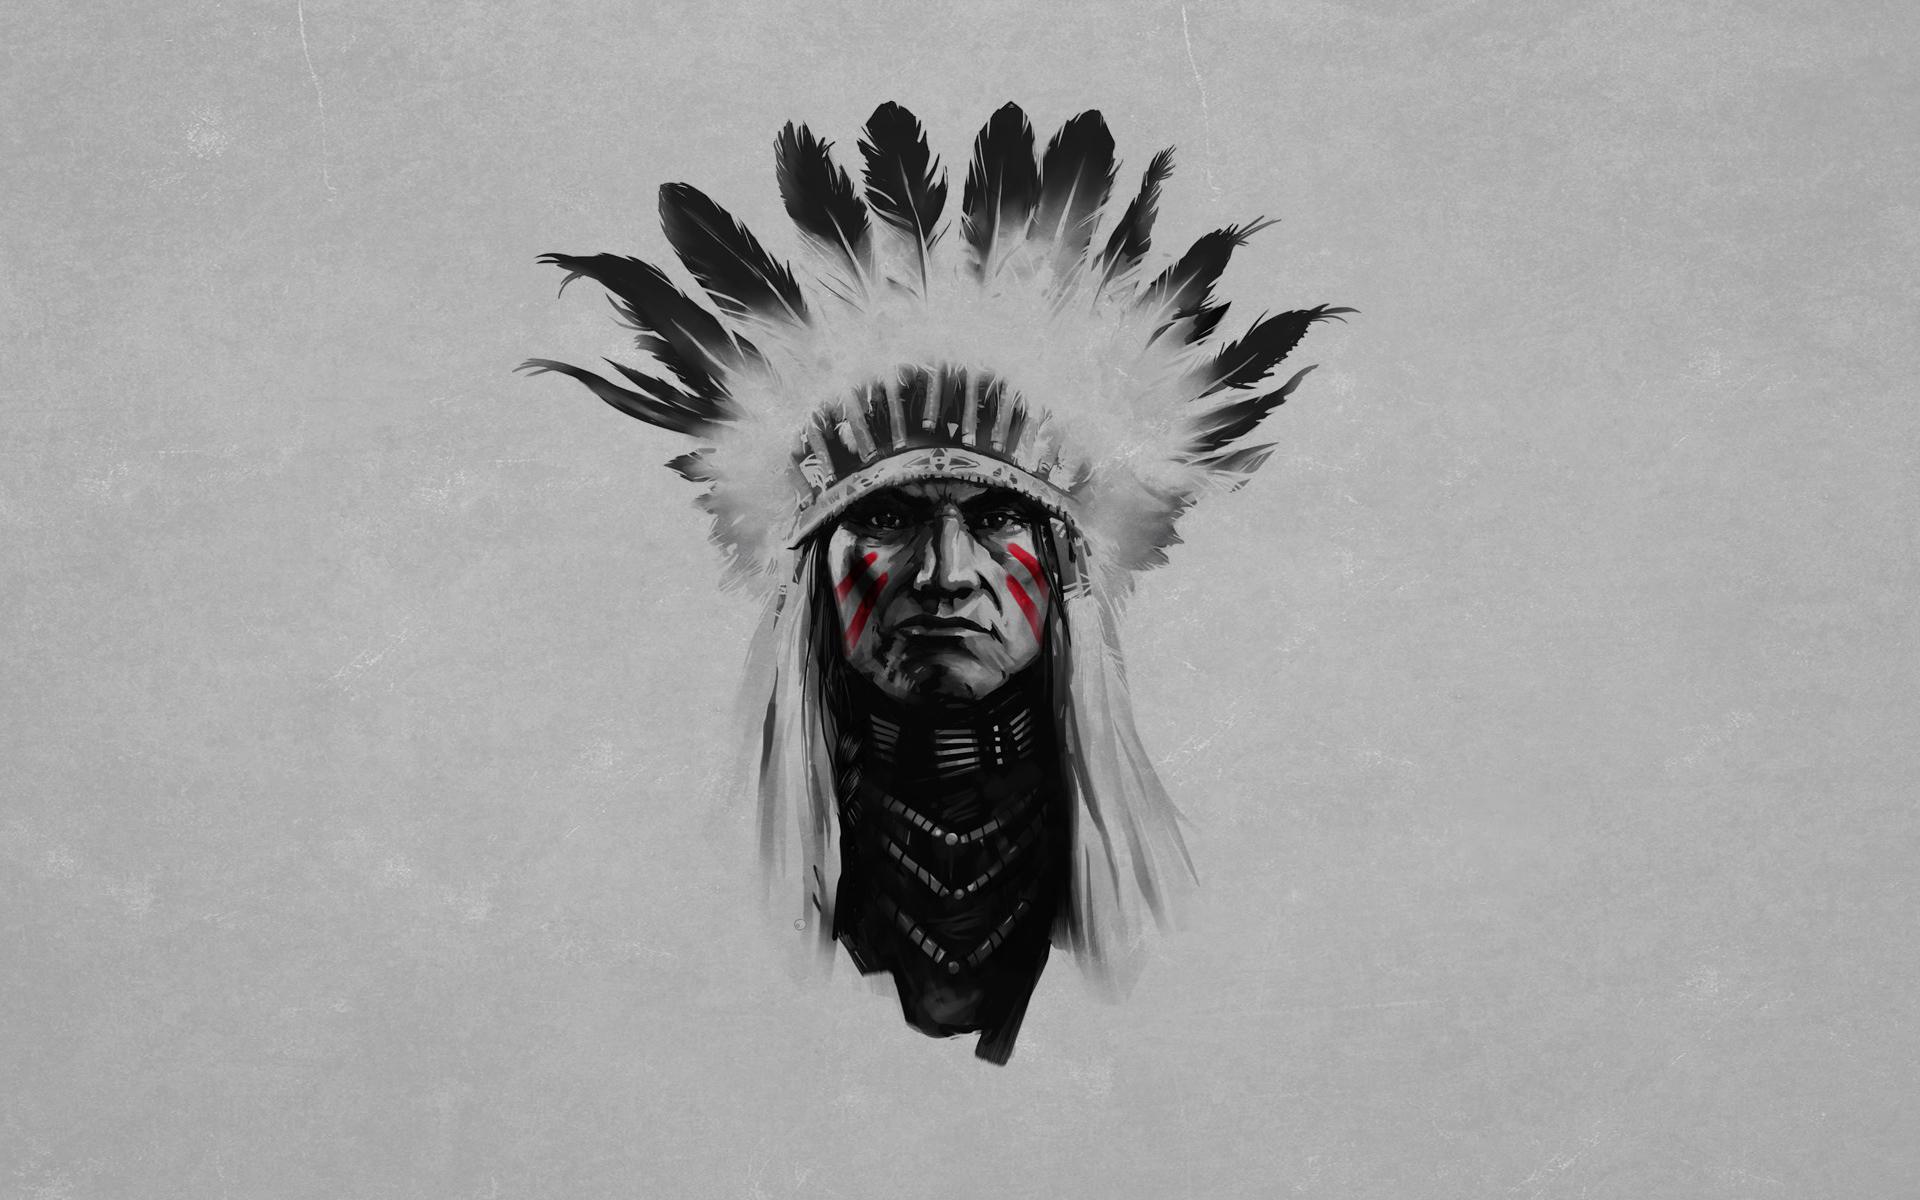 Native american full hd wallpaper and background image 1920x1200 artistic native american wallpaper voltagebd Choice Image